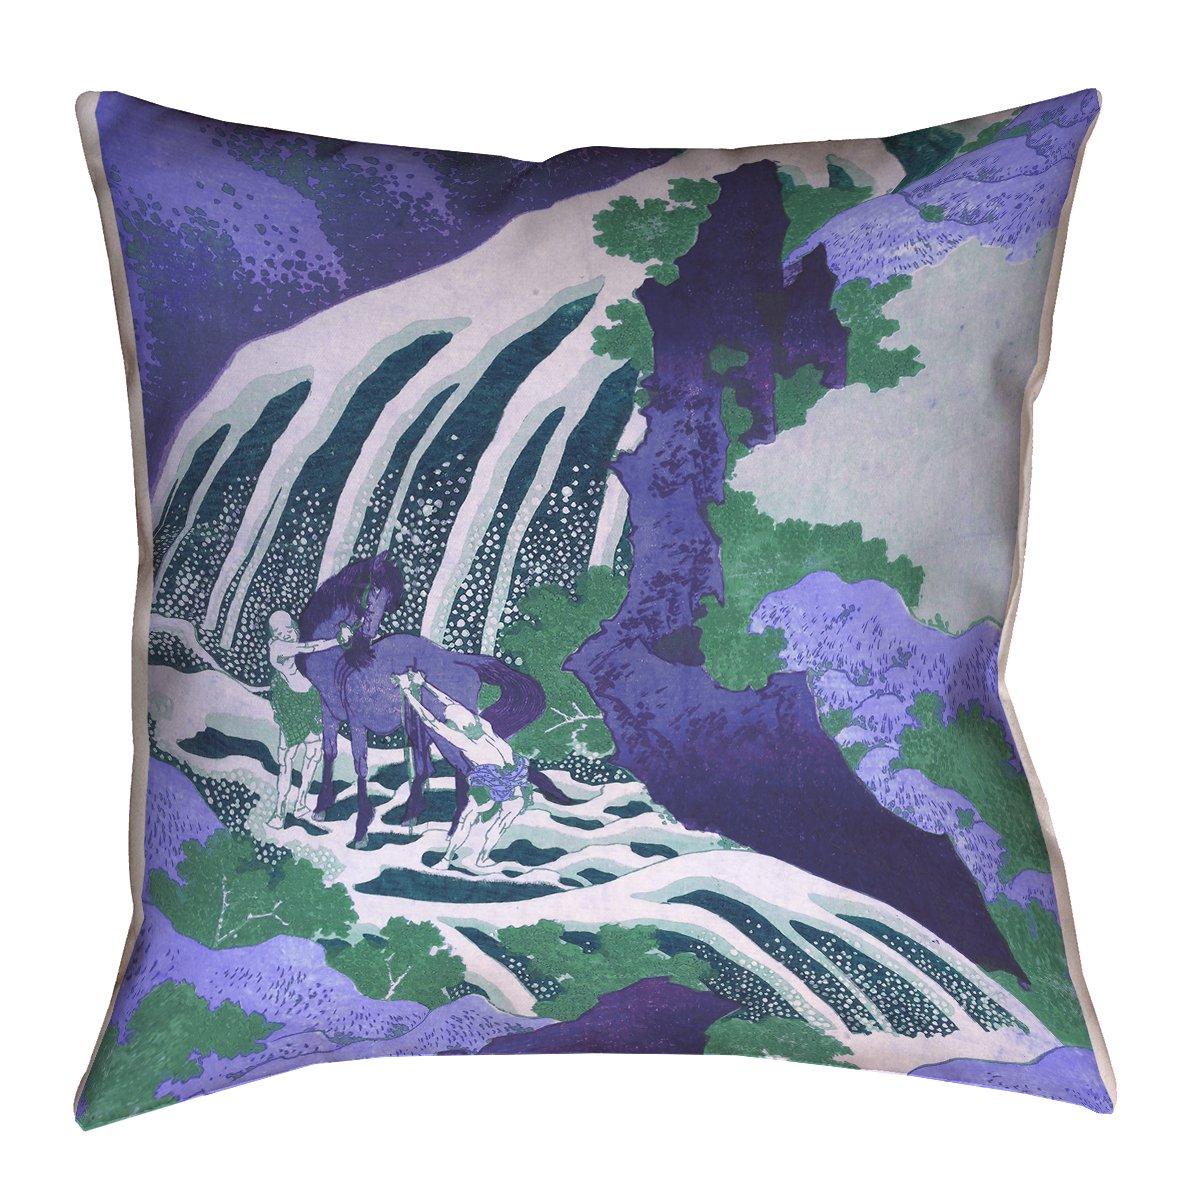 Waterproof and Mildew Proof Horse and Waterfall in Blue Pillow ArtVerse Katsushika Hokusai 16 x 16 Outdoor Pillows /& Cushions UV Properties